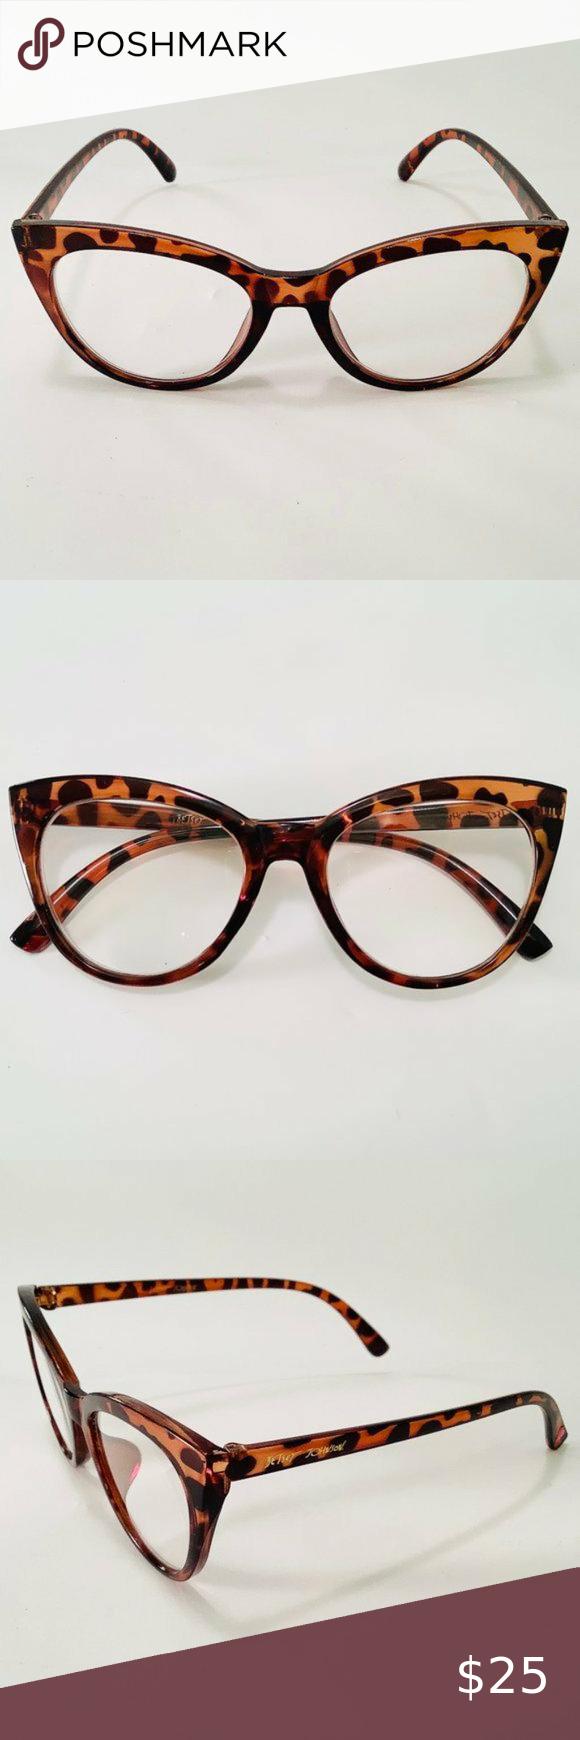 Betsey Johnson Reading Glasses Leopard Cat Eye in 2020